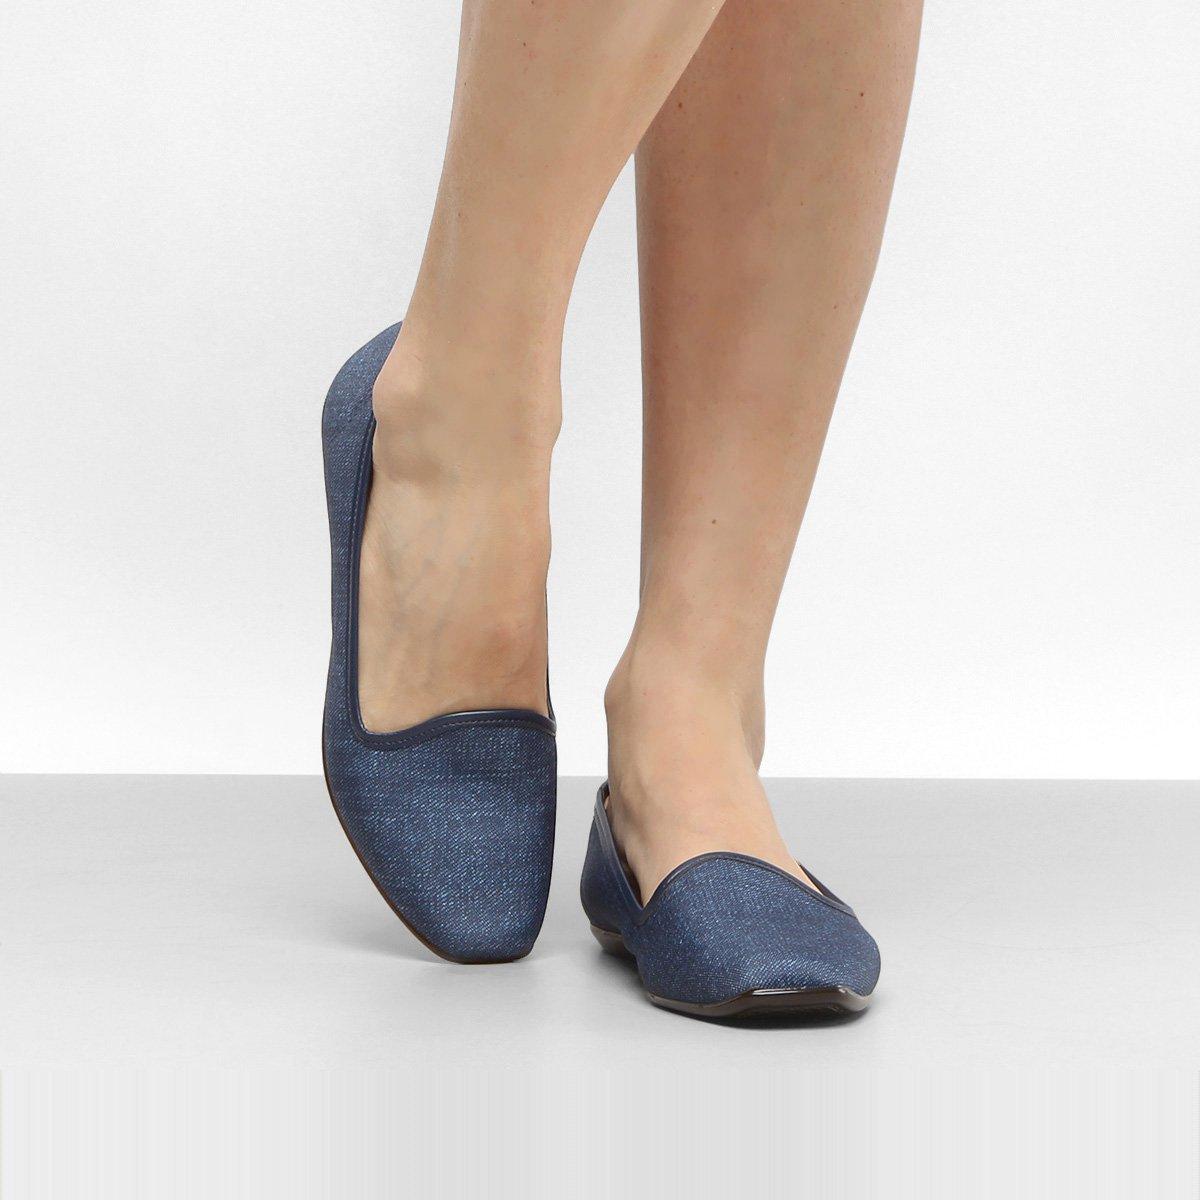 700d0d27c9 Slipper Moleca Jeans Feminino